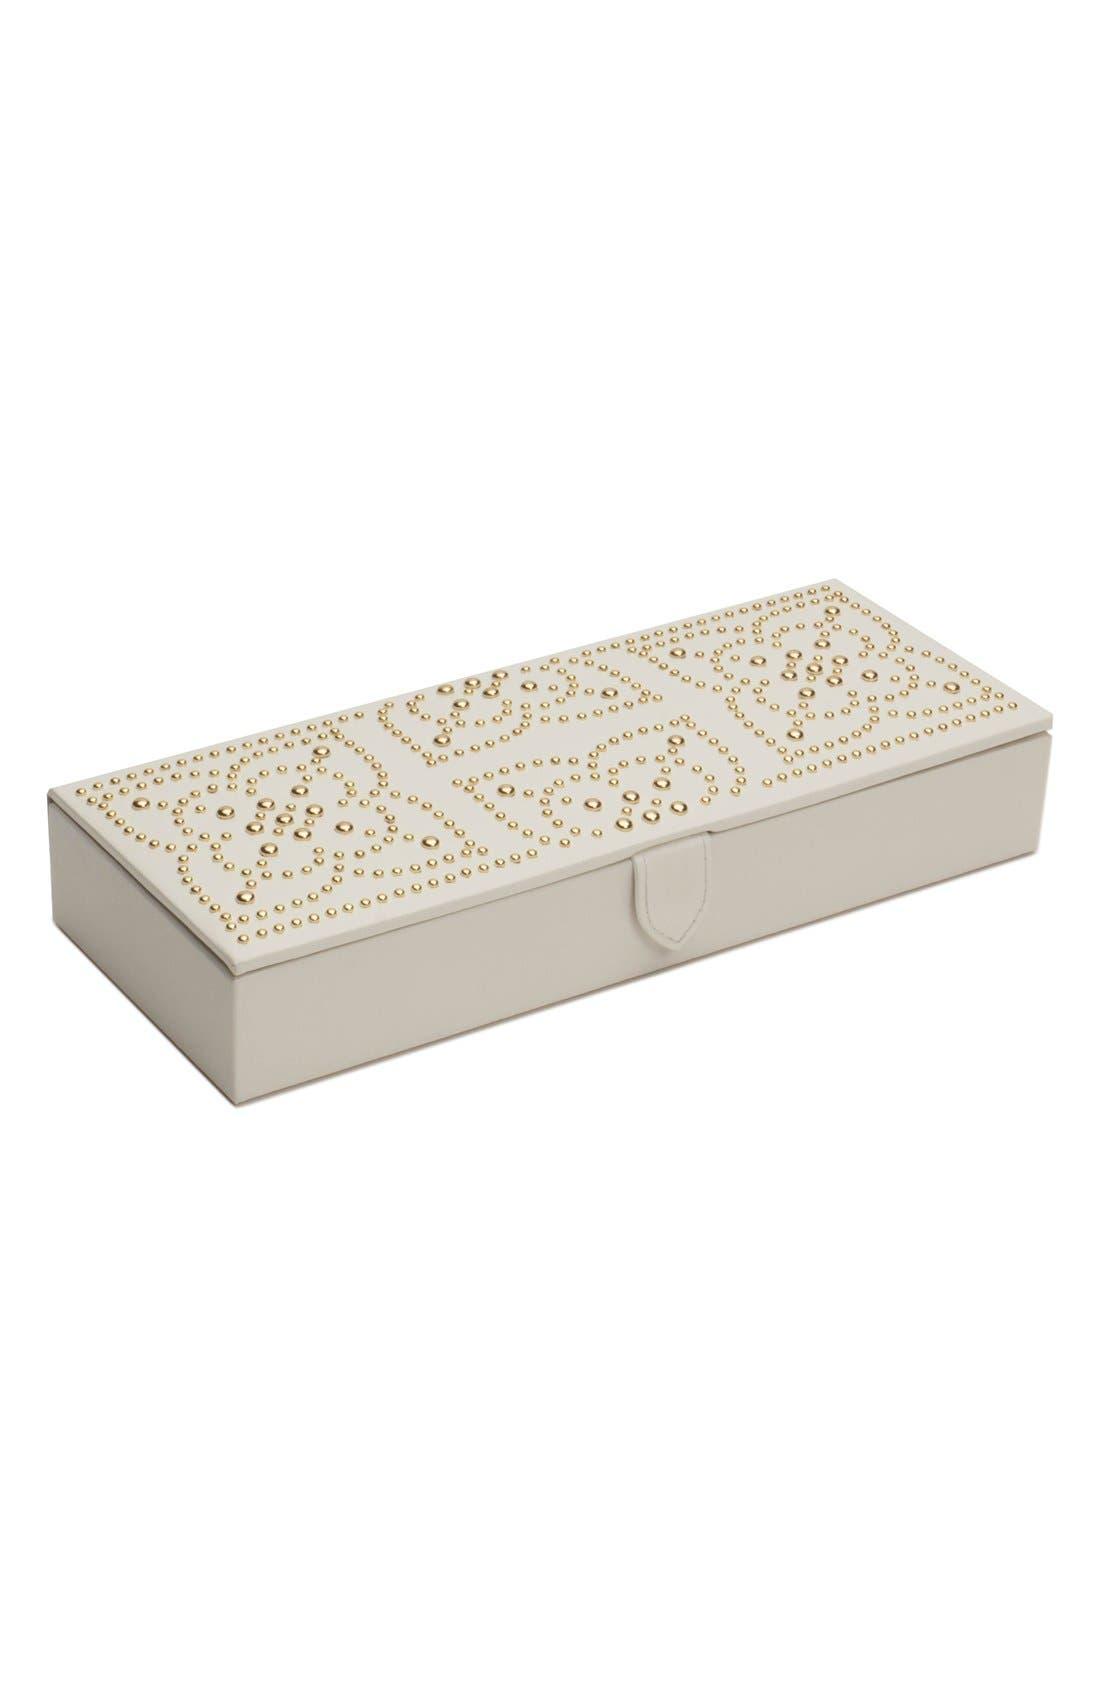 'Marrakesh' Jewelry Box,                             Main thumbnail 1, color,                             Cream